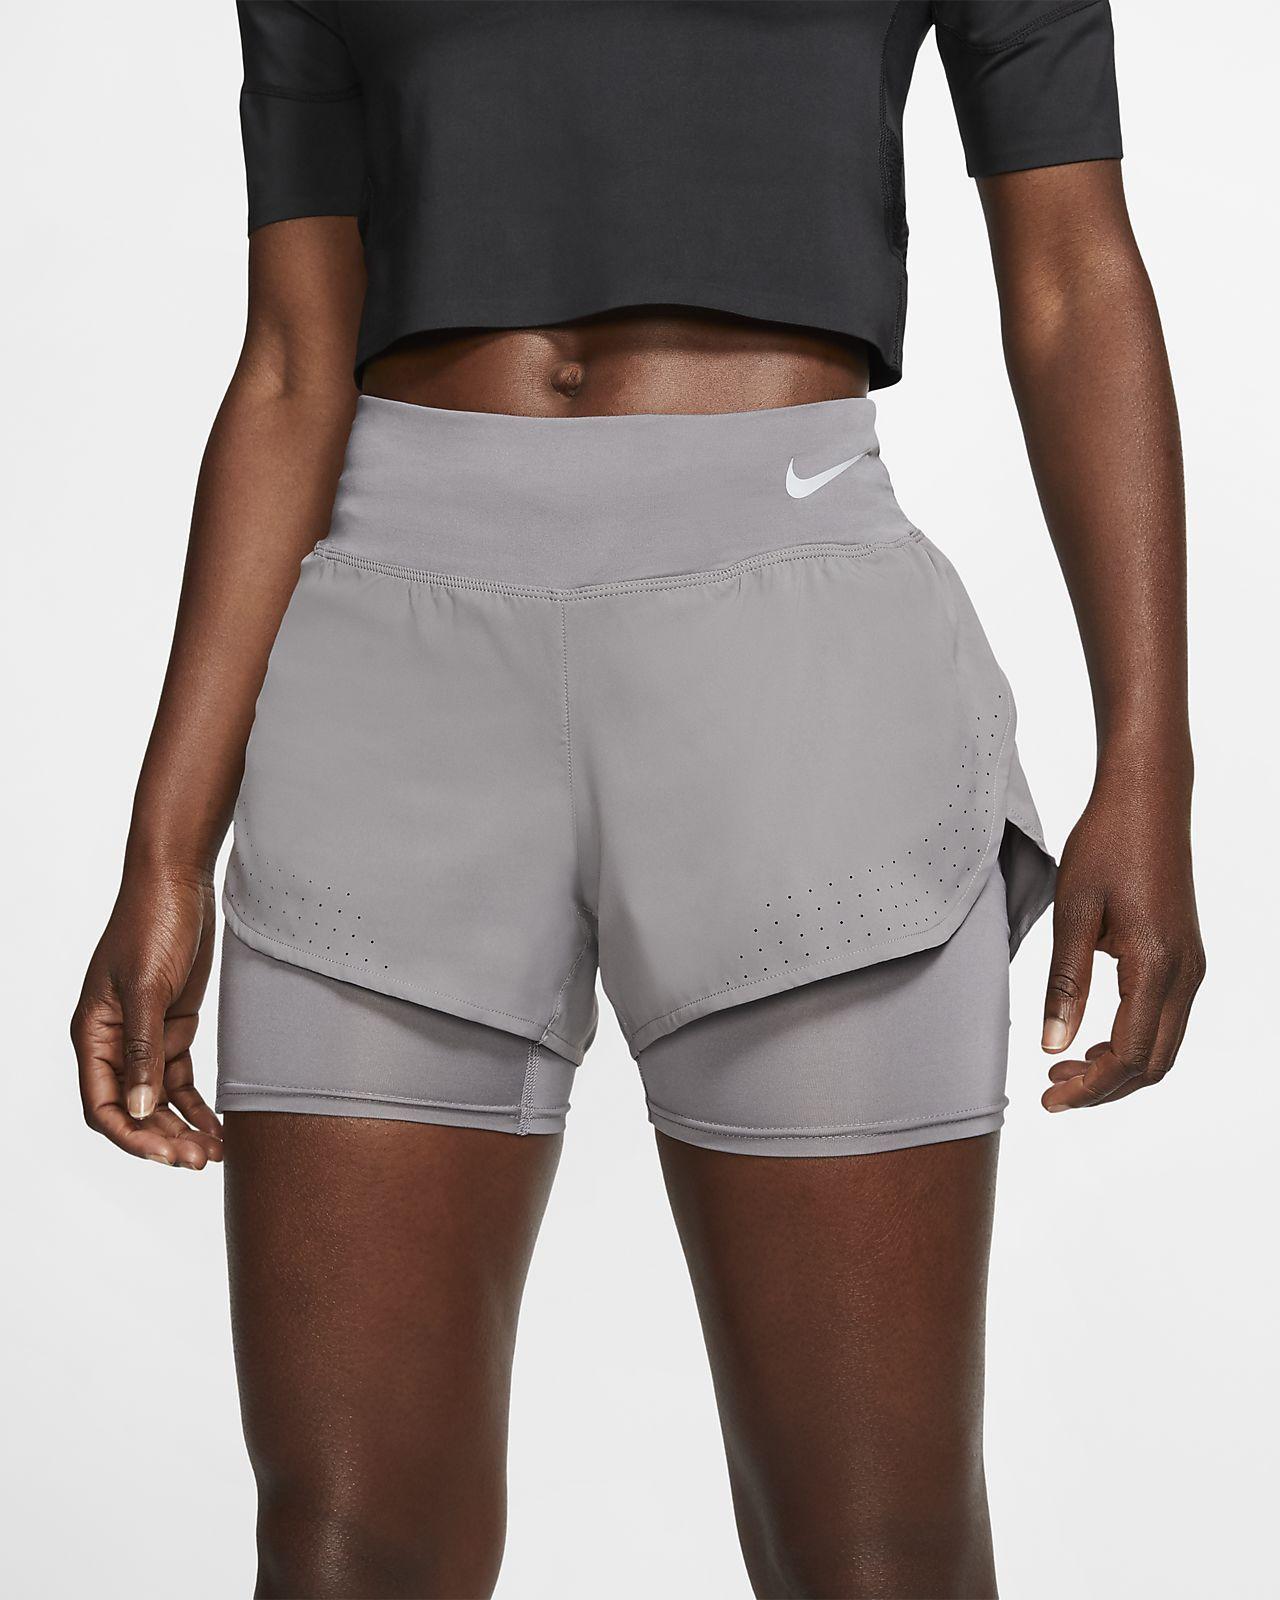 Gynaikeio Sorts Gia Tre3imo Nike Eclipse 2 Se 1 Nike Gr Ropa De Tenis Ropa Deportiva Mujer Ropa Fitness